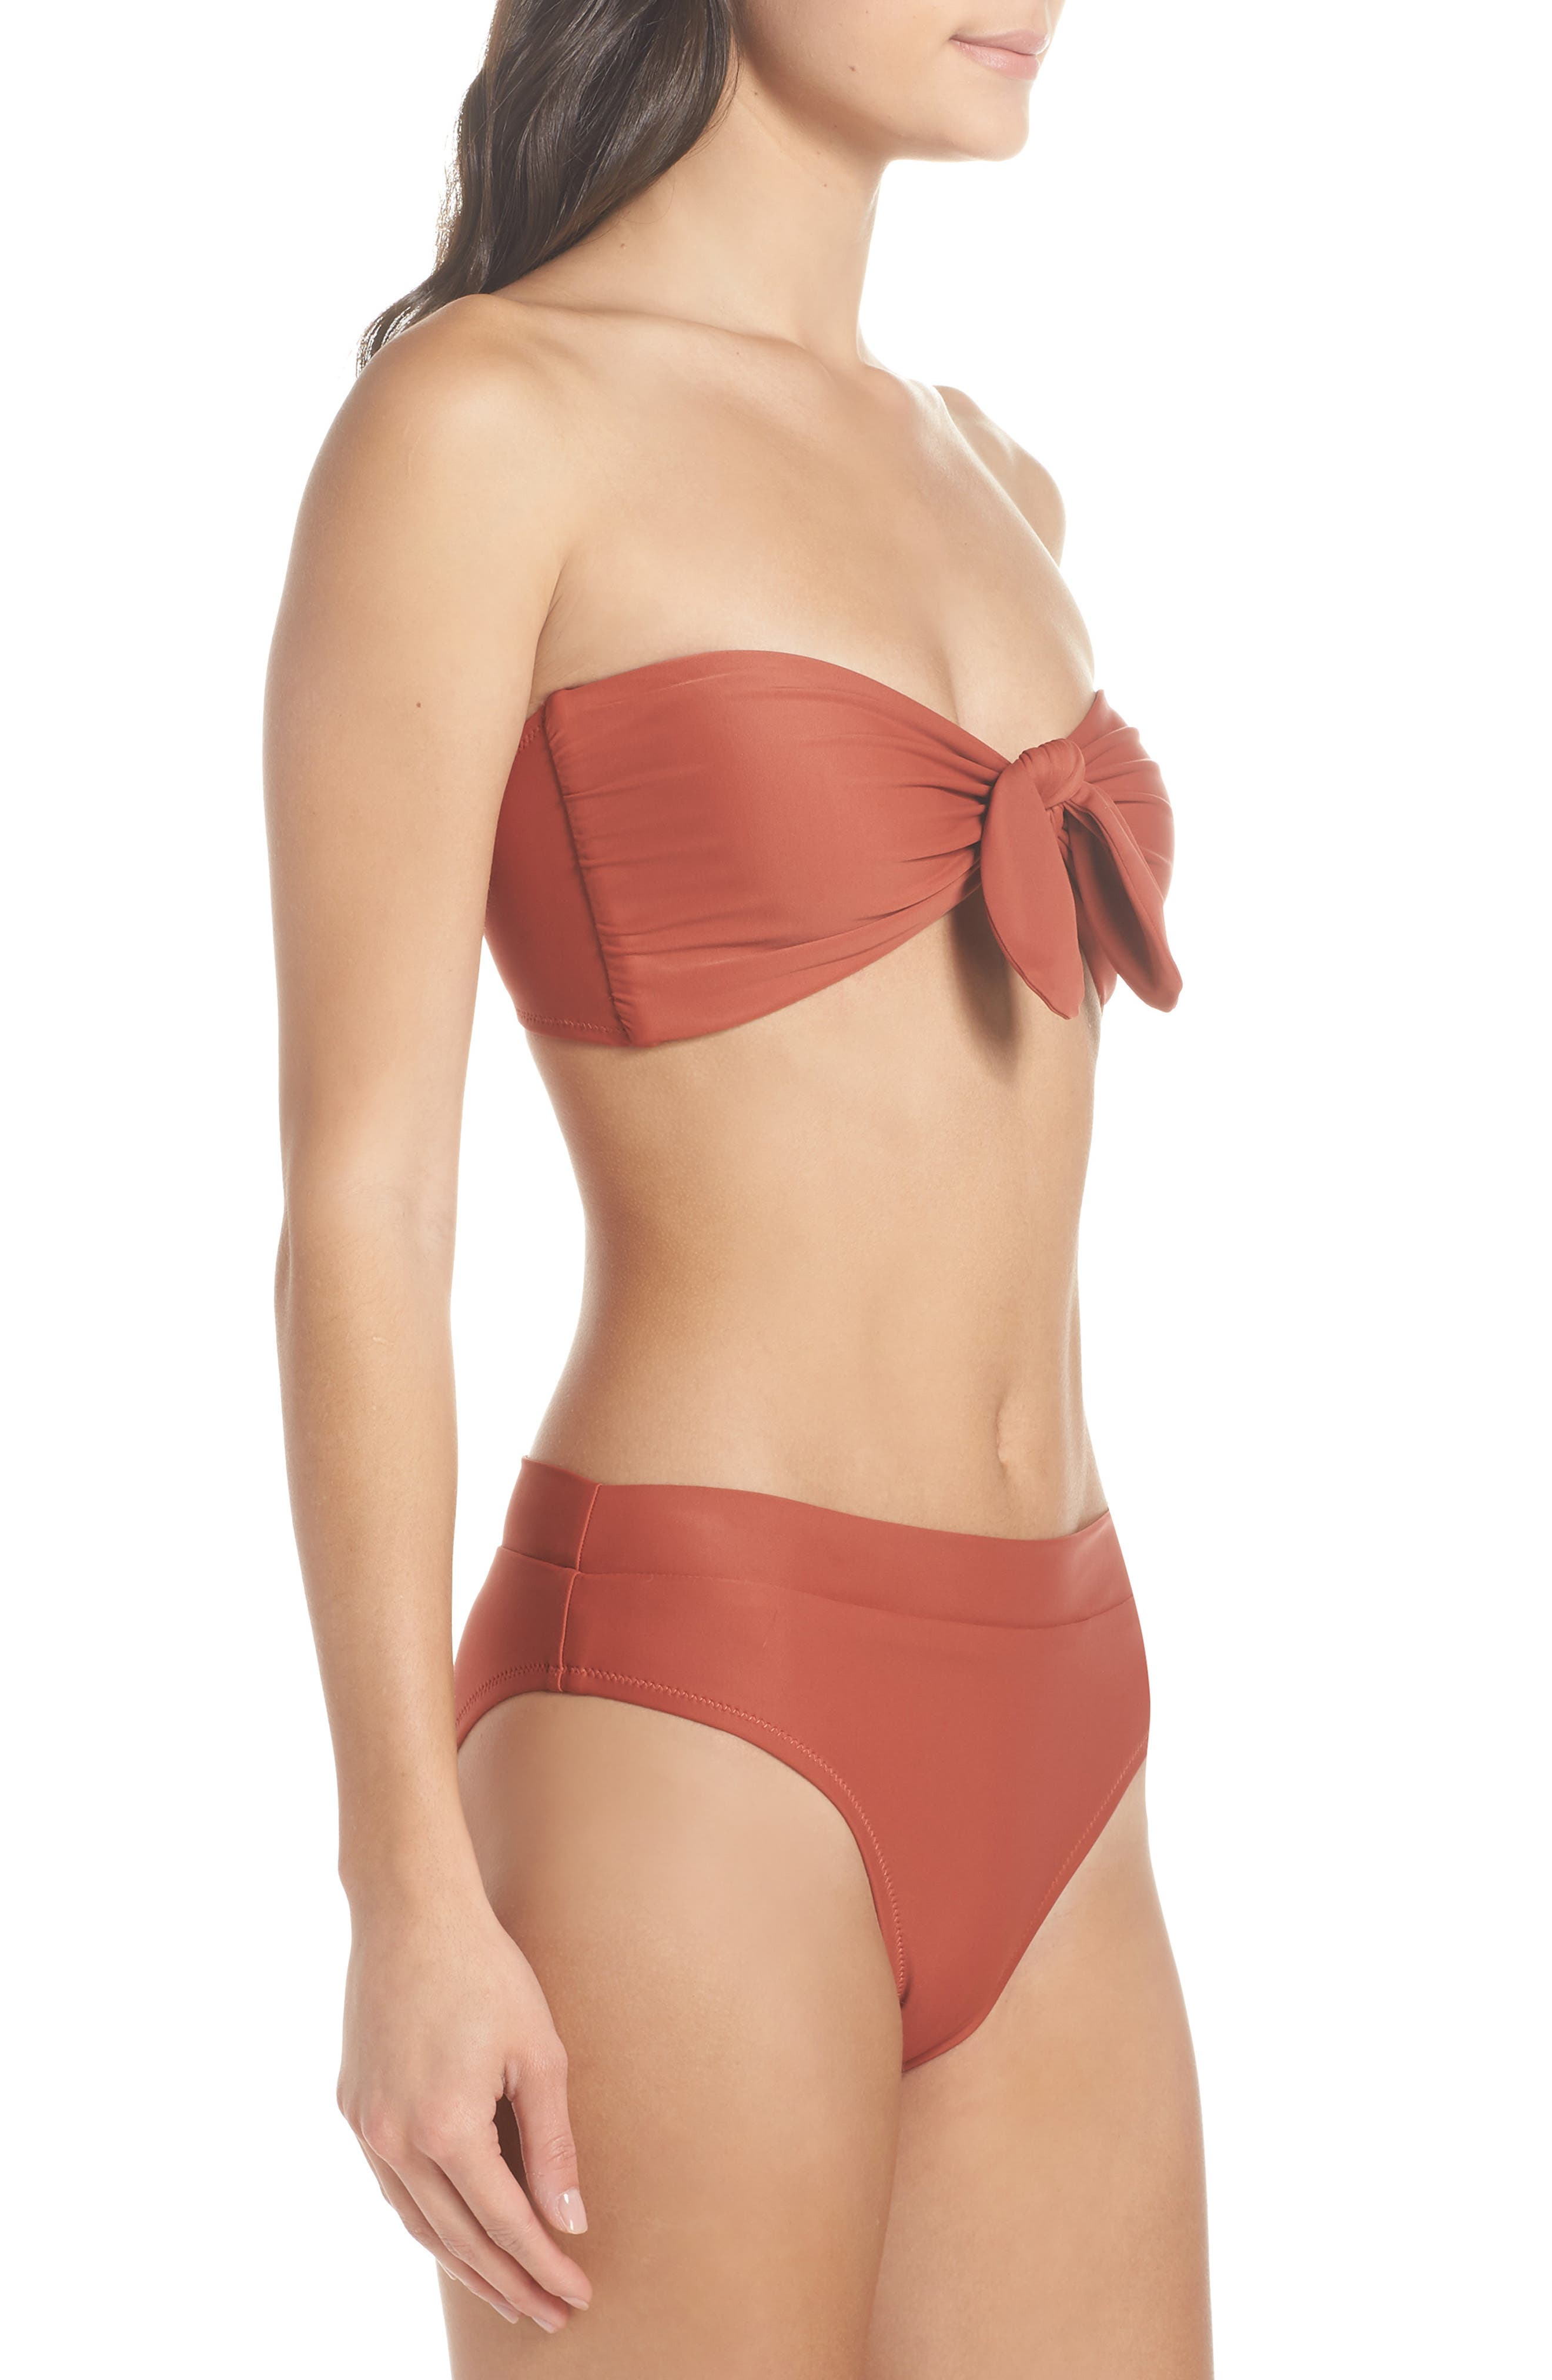 Fairfax Bandeau Bikini Top,                             Alternate thumbnail 7, color,                             Copper